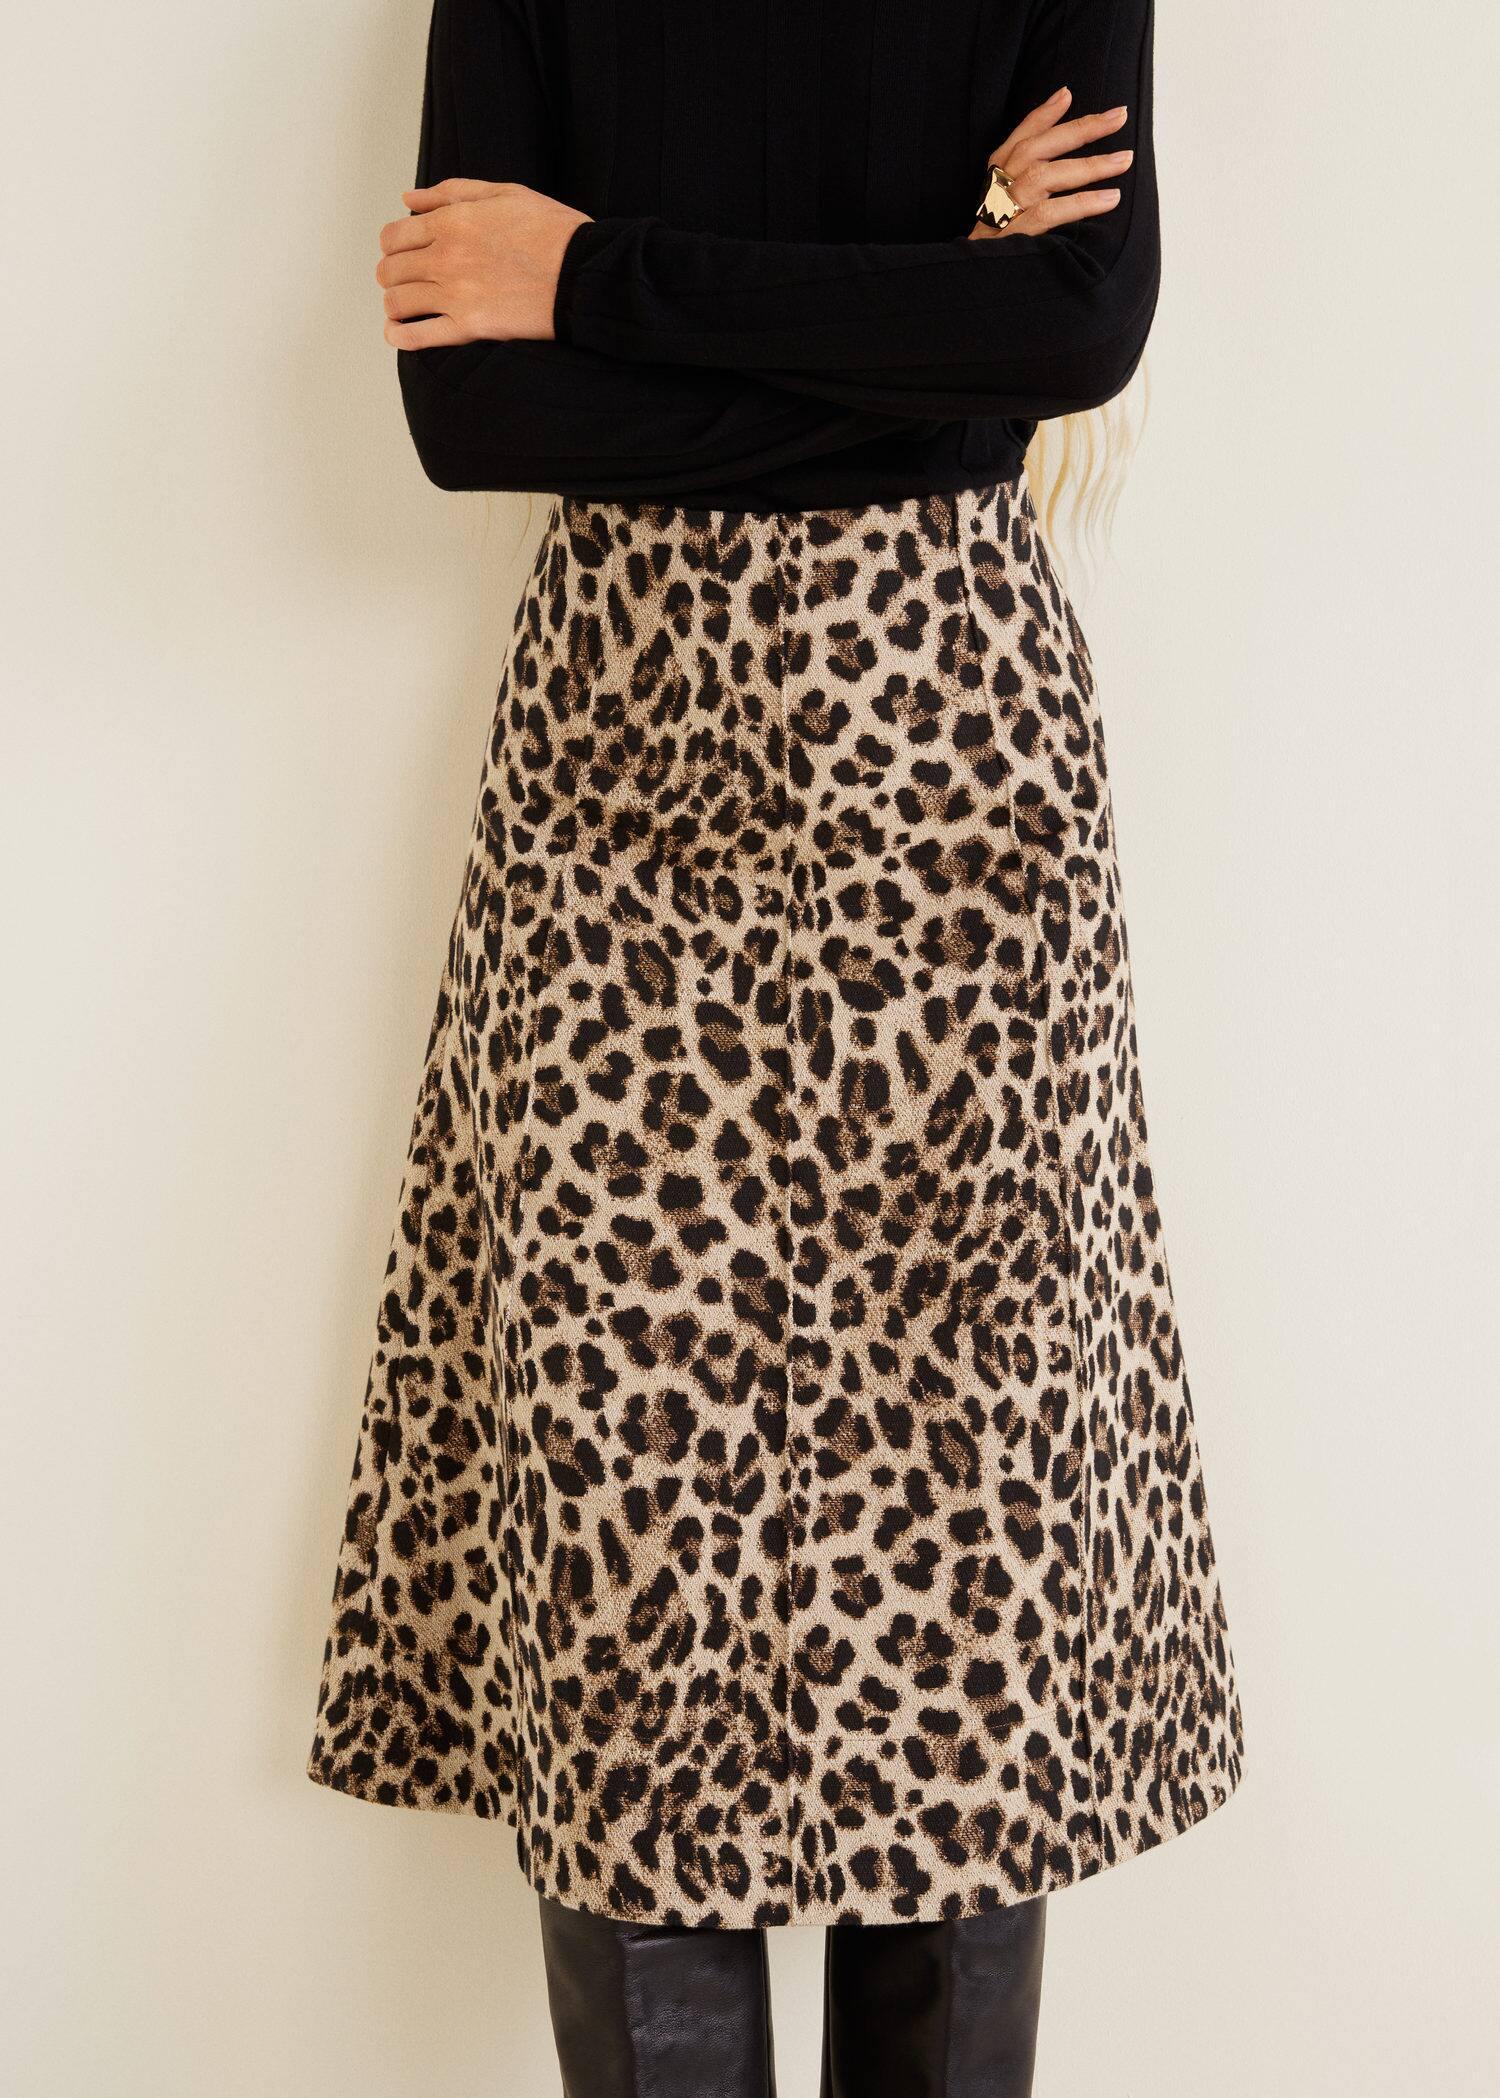 venta minorista 05e4d 52ffd Falda midi leopardo - Mujer | OUTLET Islas Canarias